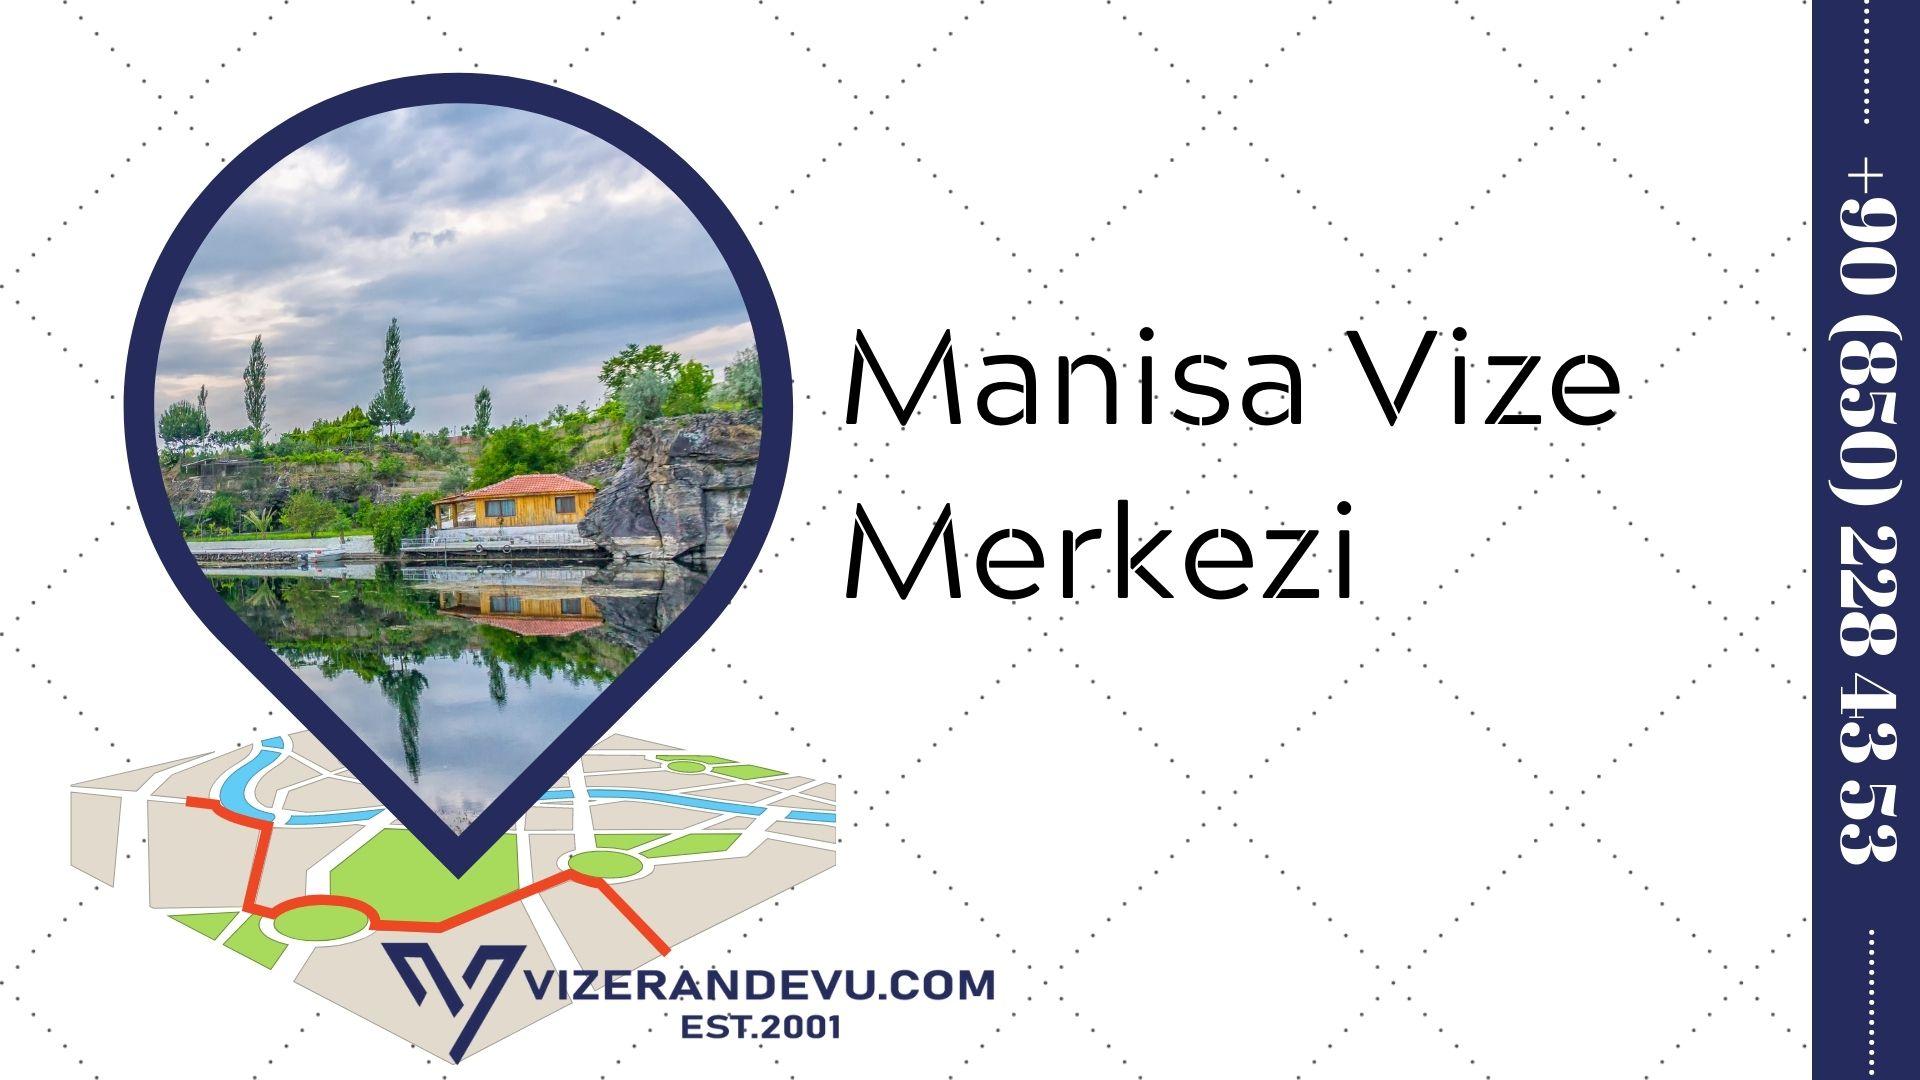 Manisa Vize Merkezi